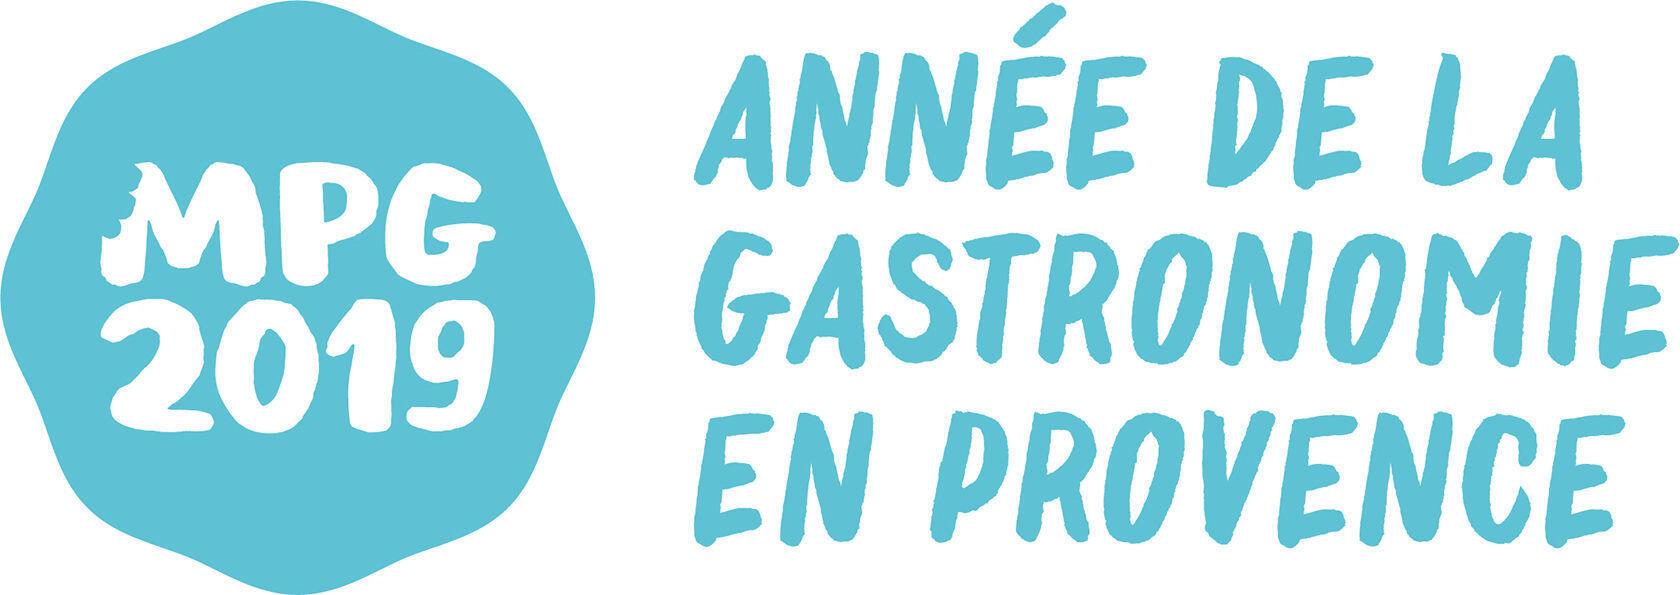 LOGO Marseille Provence Gastronomy 2019